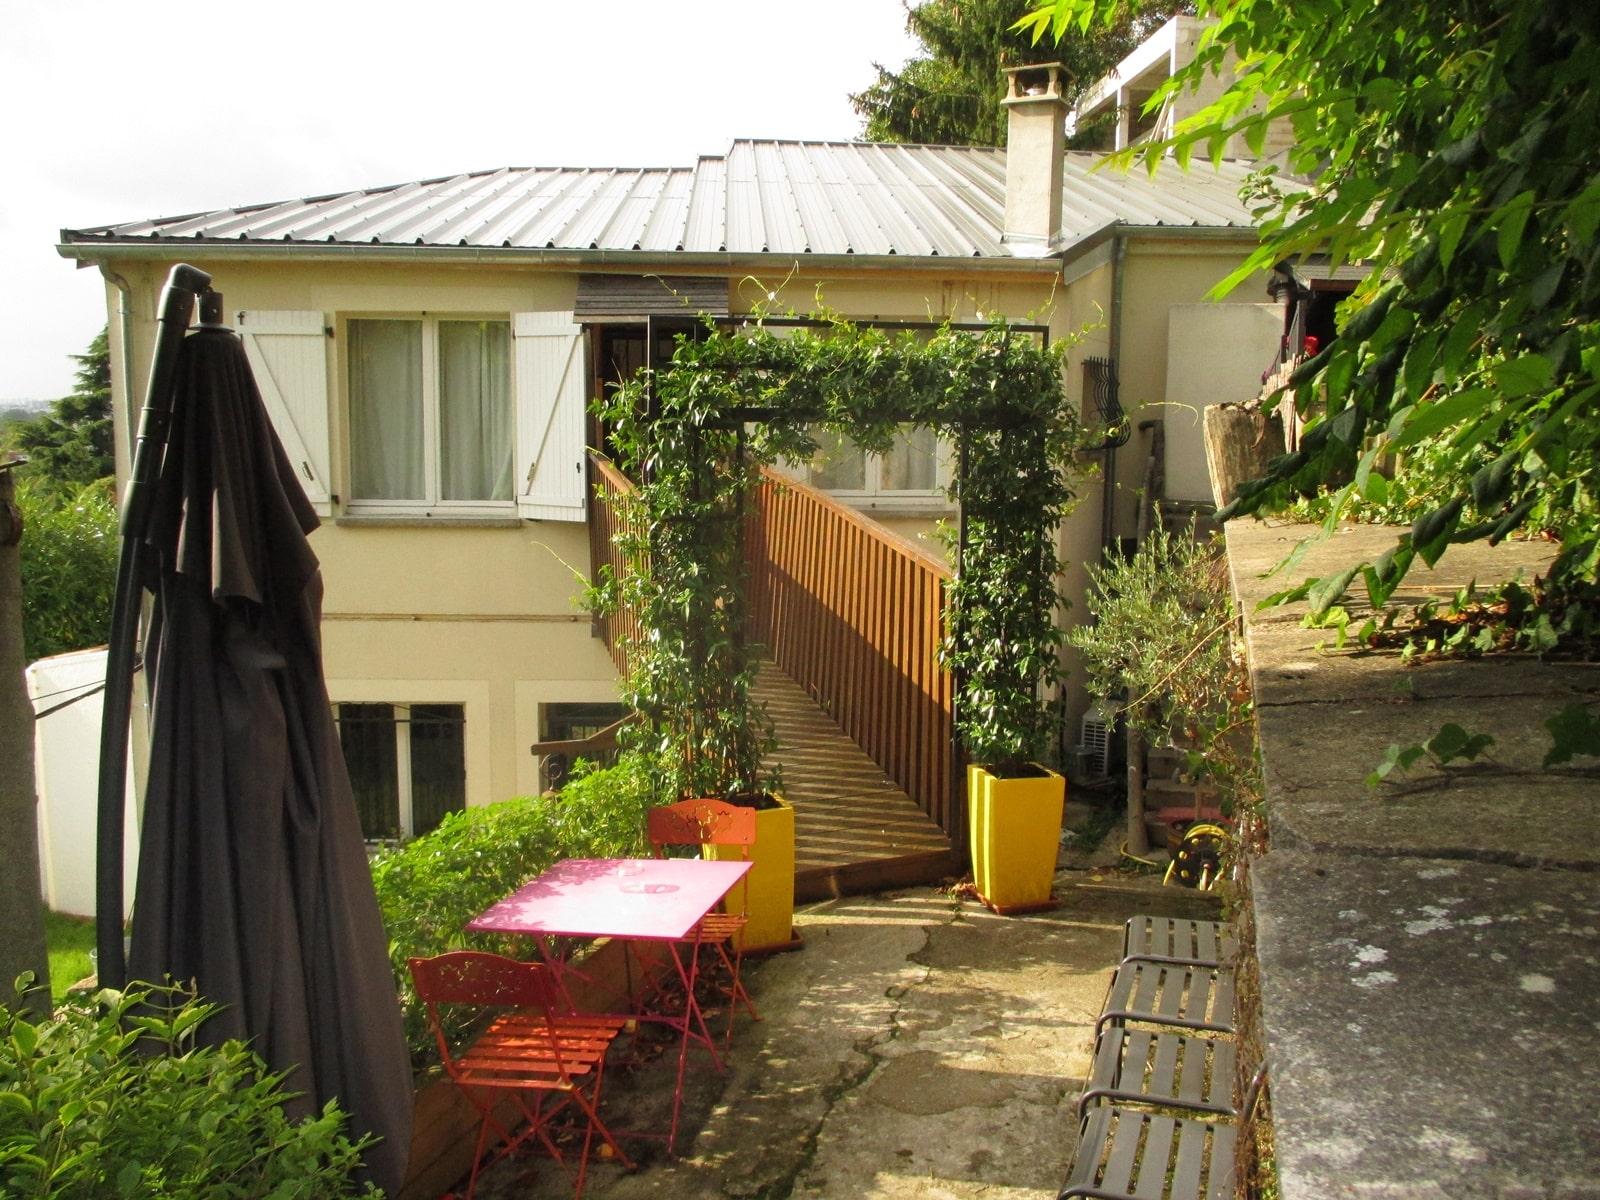 Les-chambres-d-hotes-du-Grand-Paris-5